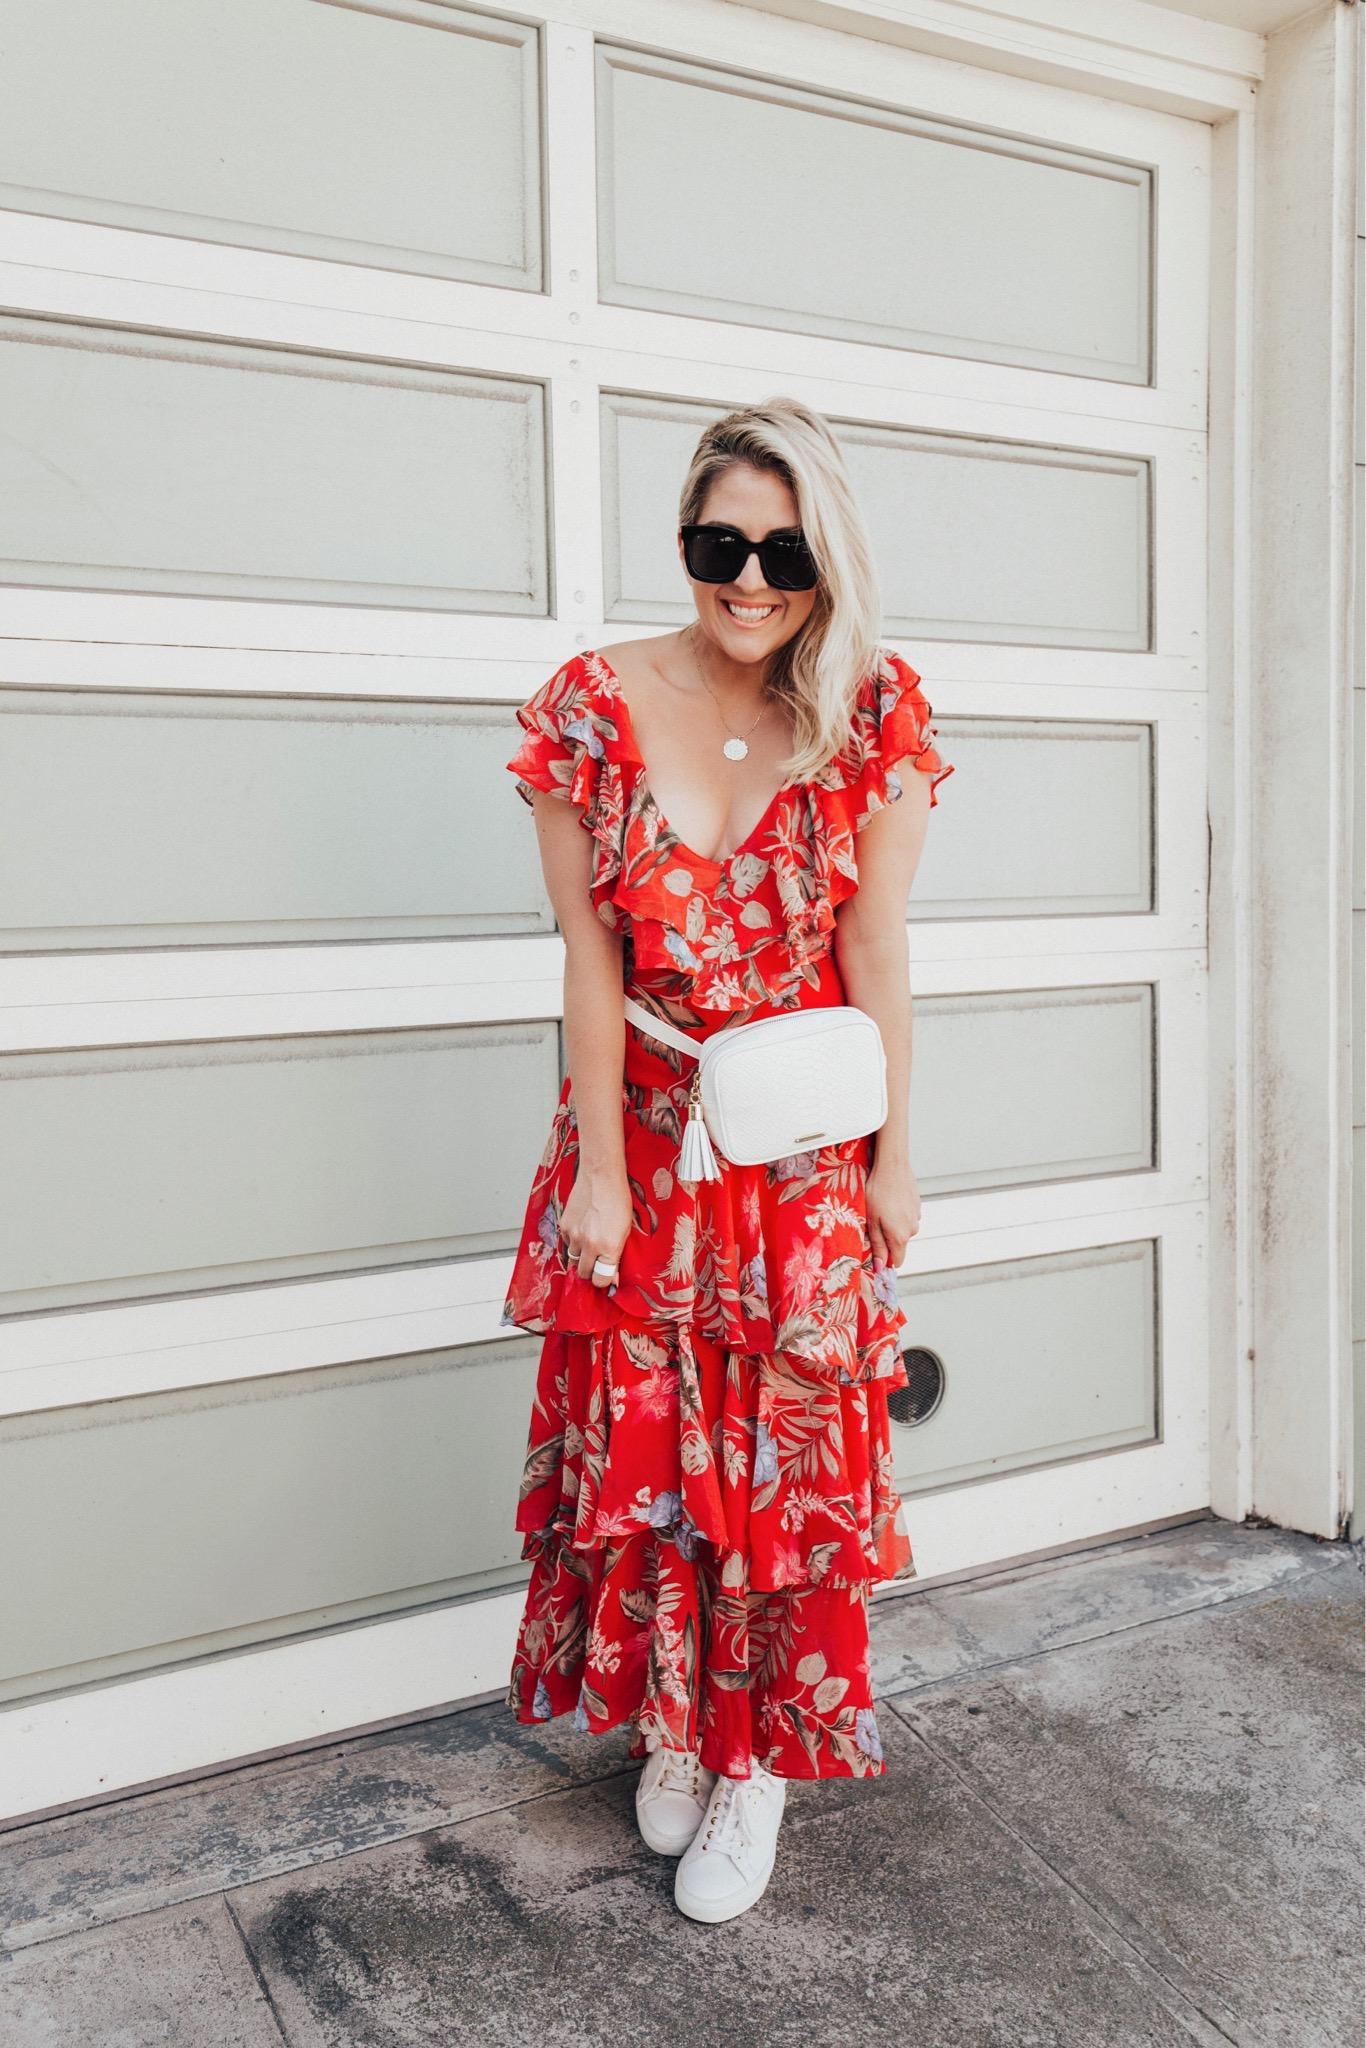 WAYF Chelsea Tiered Ruffle Maxi Dress, Summer Dresses, WAYF, Katwalksf, Kat Ensign, WAYF, Nordstrom